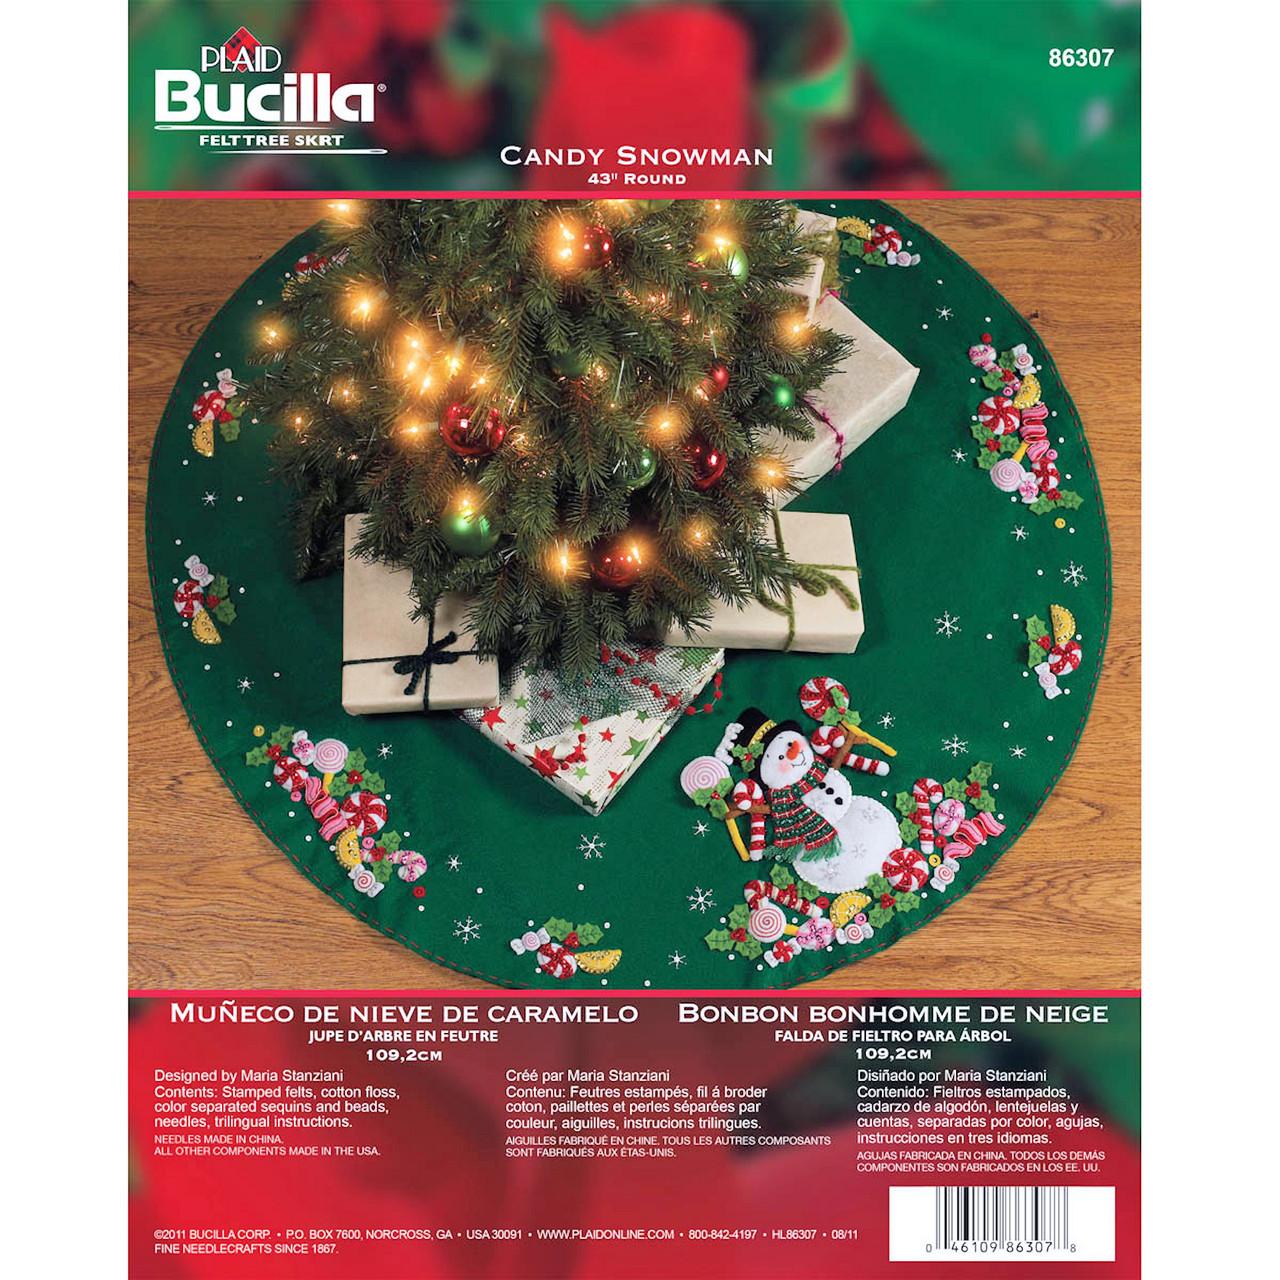 Plaid / Bucilla - Candy Snowman Tree Skirt